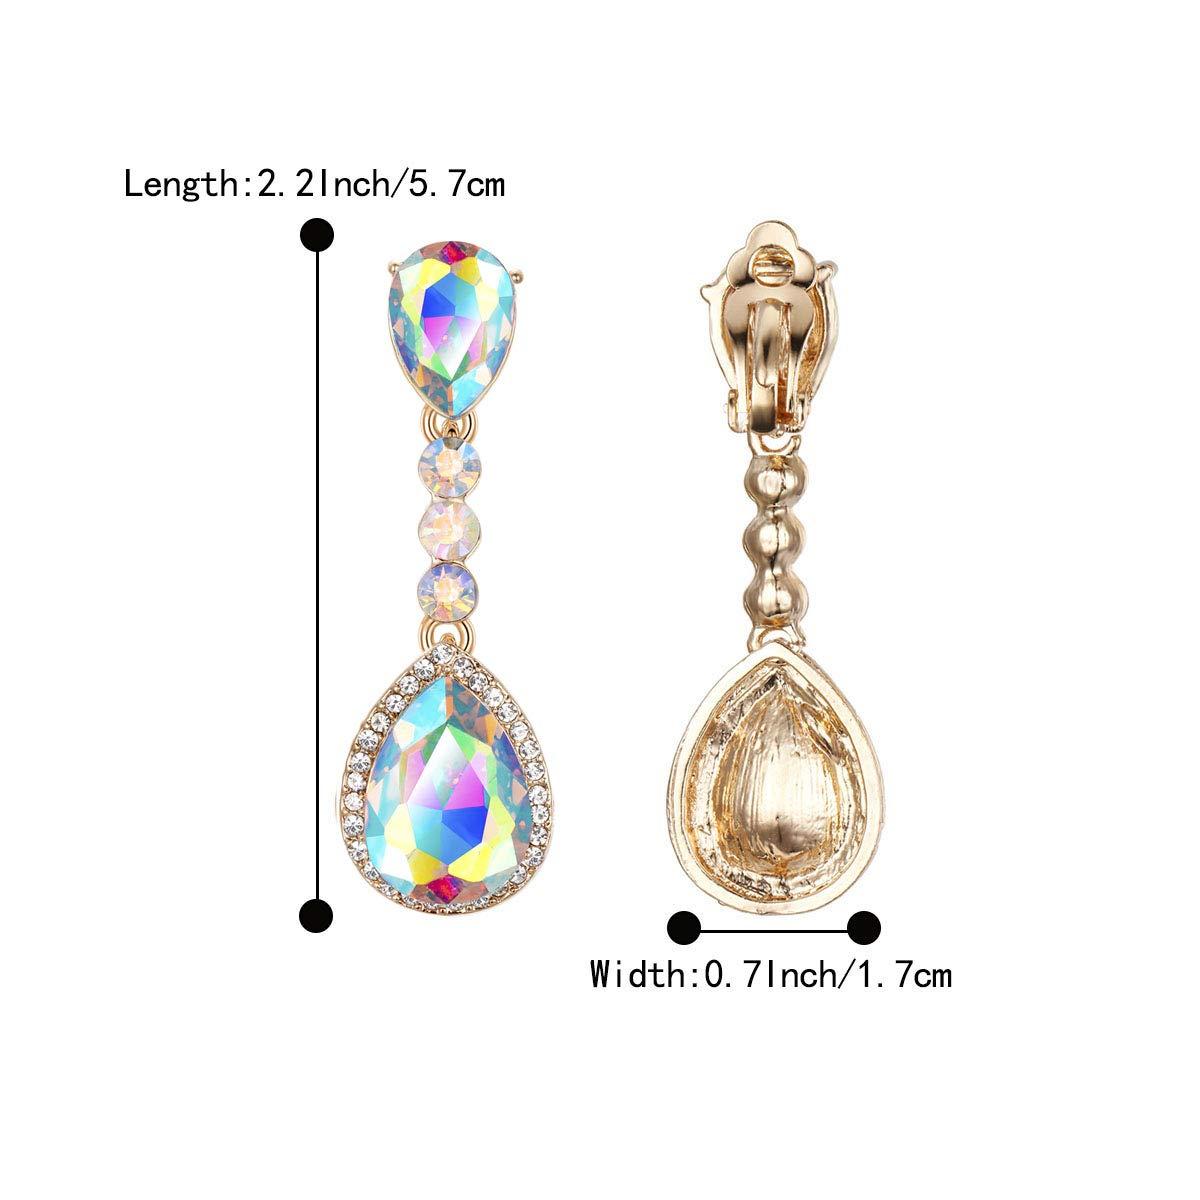 BriLove Womens Fashion Wedding Bridal Crystal Teardrop Romantic Dangle Clip-On Earrings